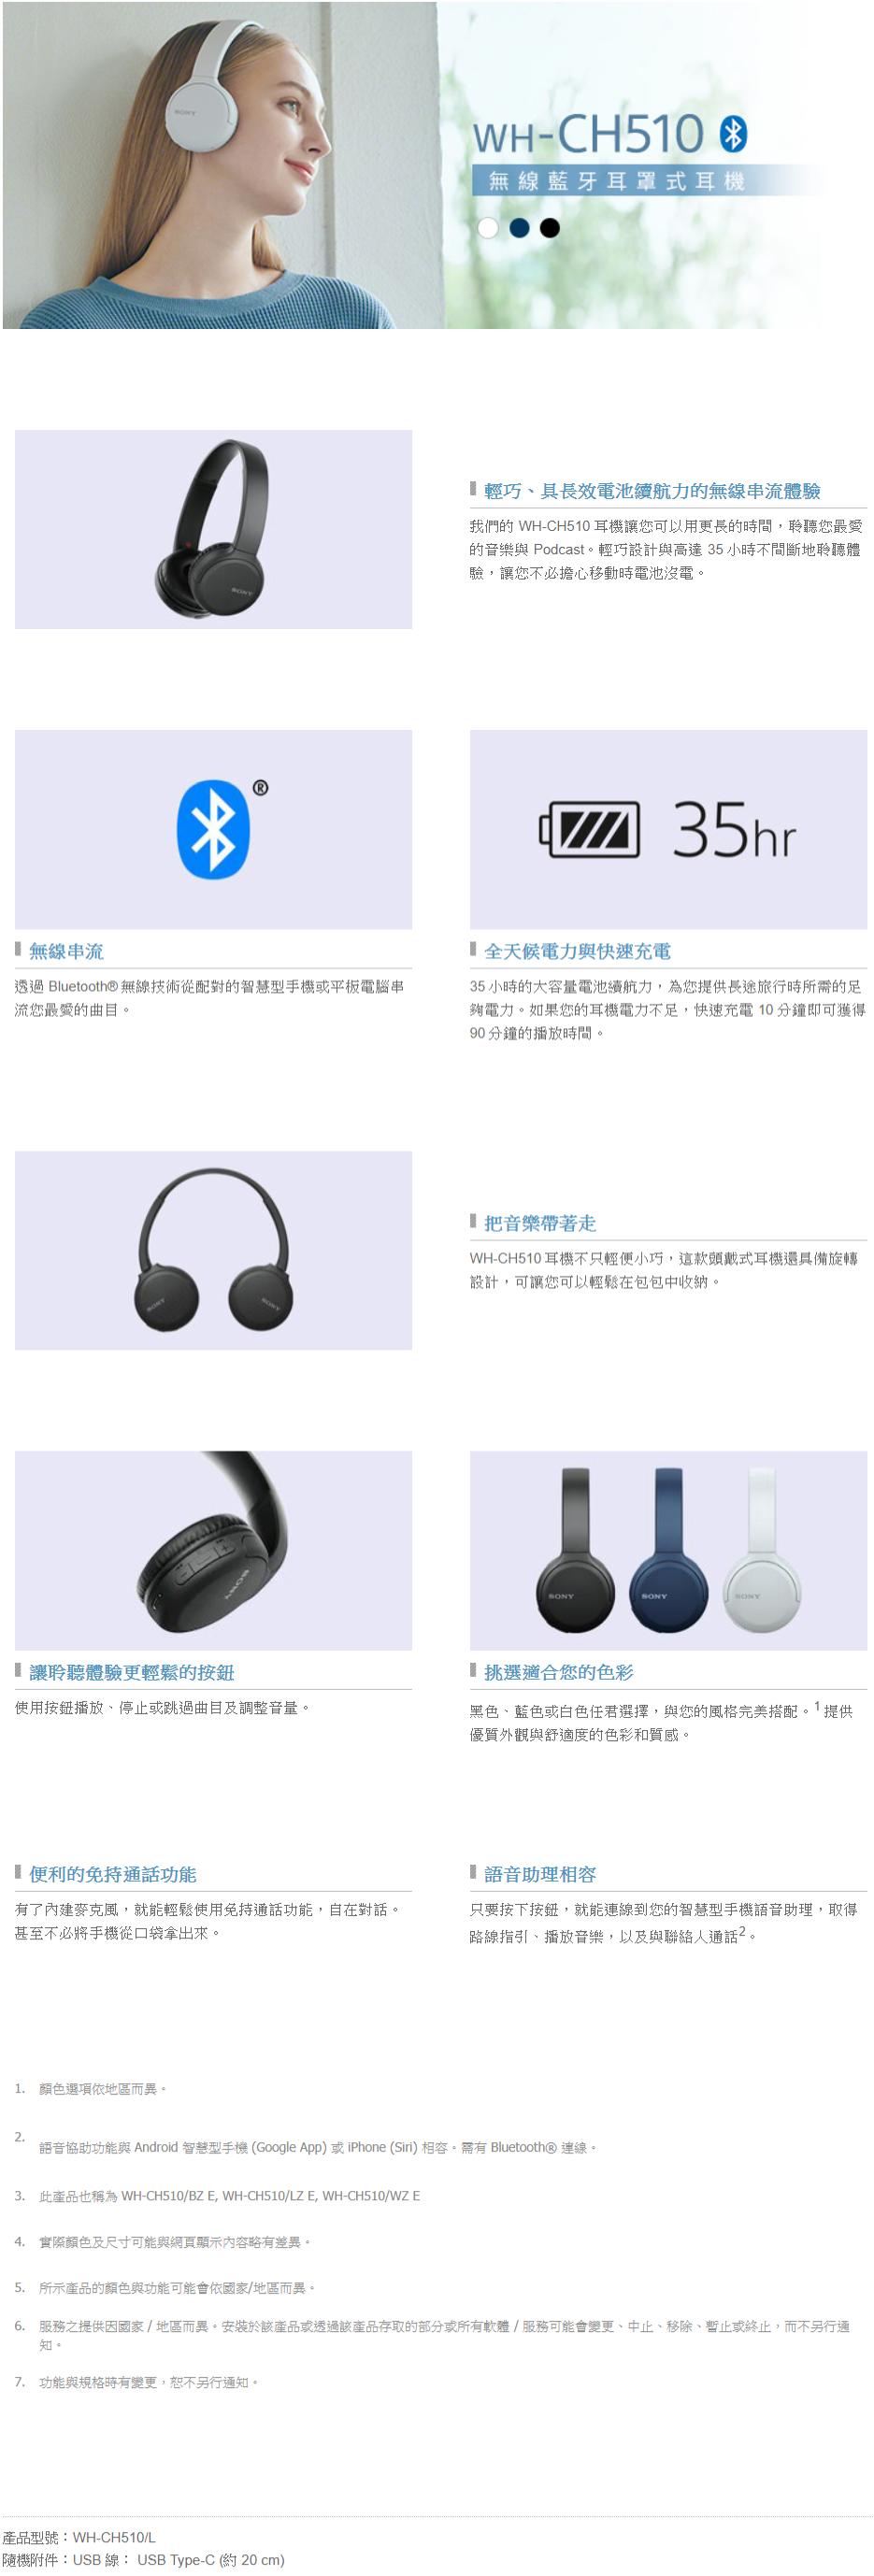 FireShot Capture 109 - WH-CH510 - 無線耳機 - Sony 台灣官方購物網站 - Sony Store, Online (Taiwan)_ - store.sony.com.tw